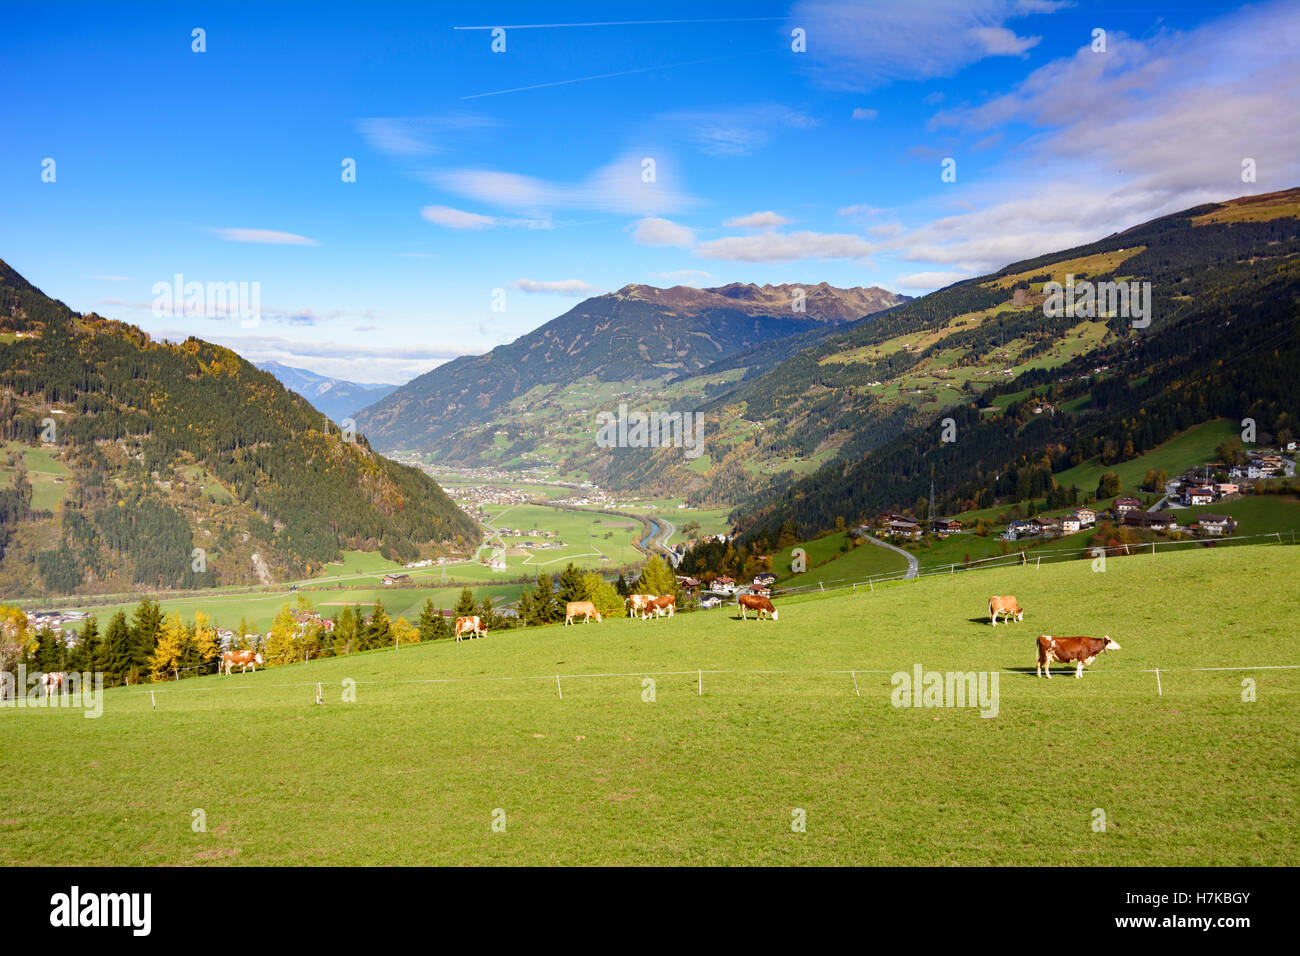 Zell am Ziller: Zillertal valley, alp alpine pasture, cows, Zell-Gerlos, Tirol, Tyrol, Austria - Stock Image